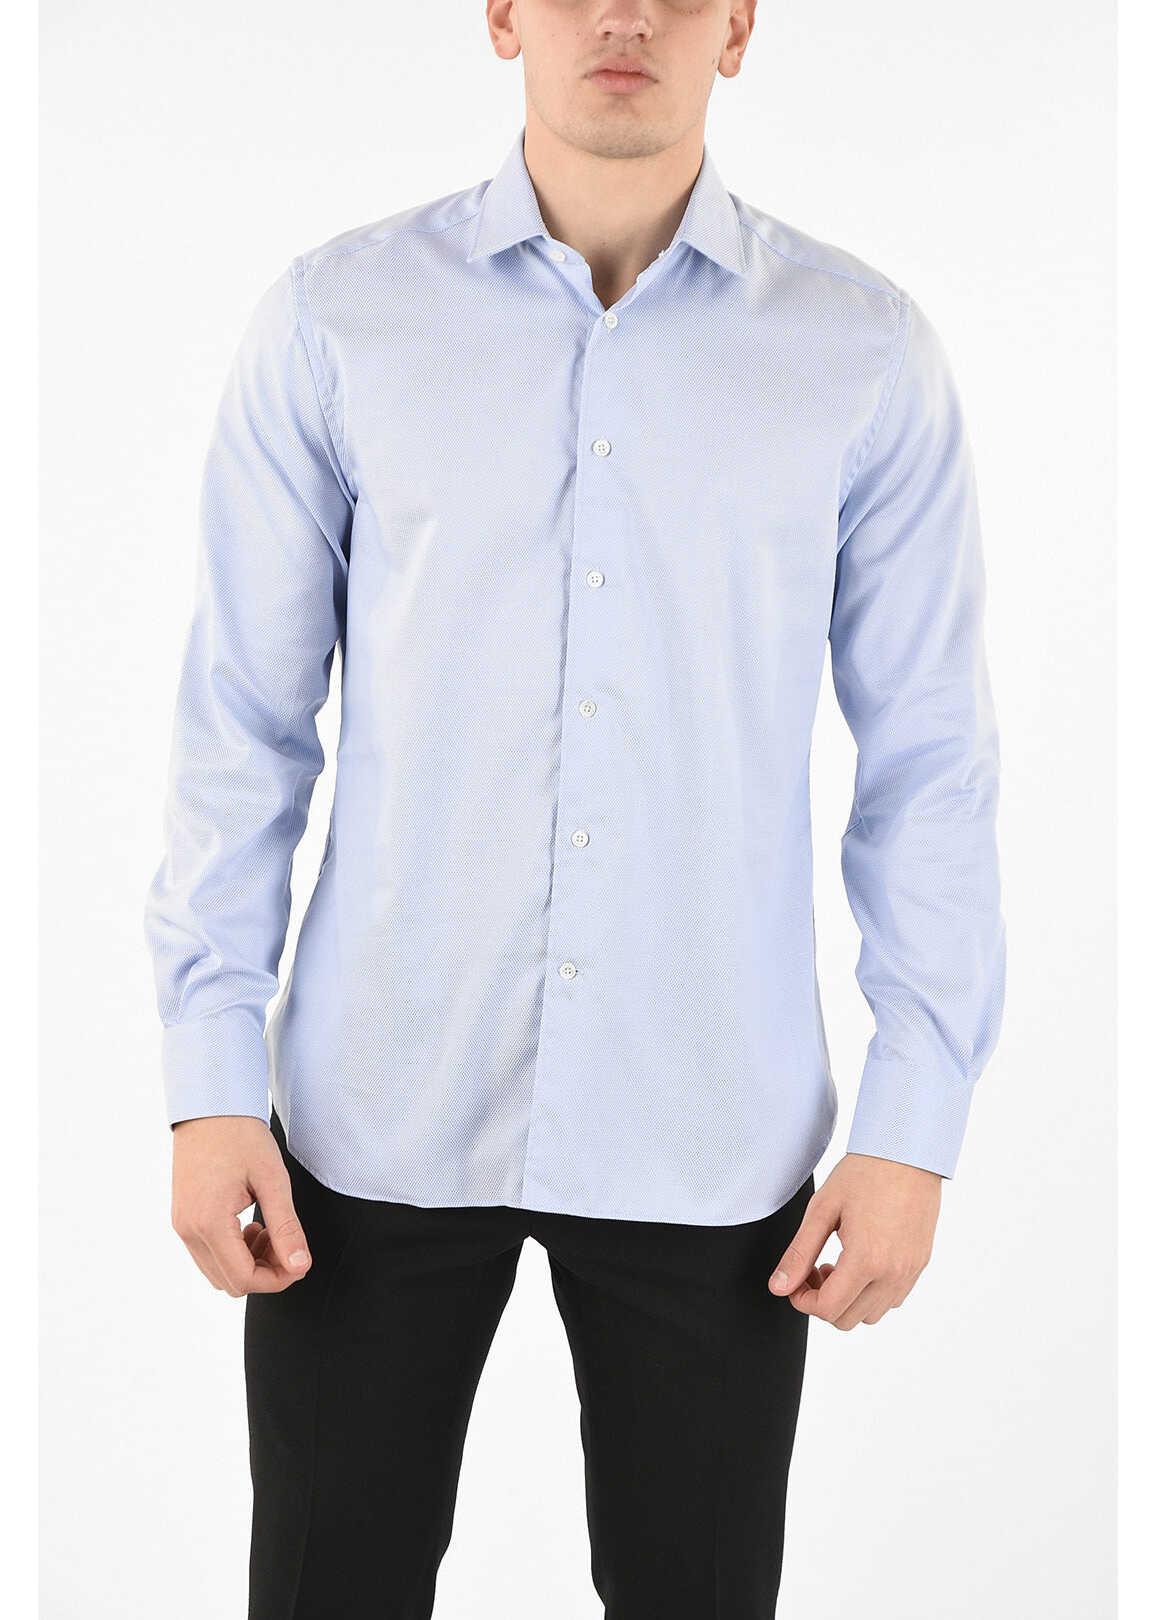 CORNELIANI pin point spread collar shirt LIGHT BLUE imagine